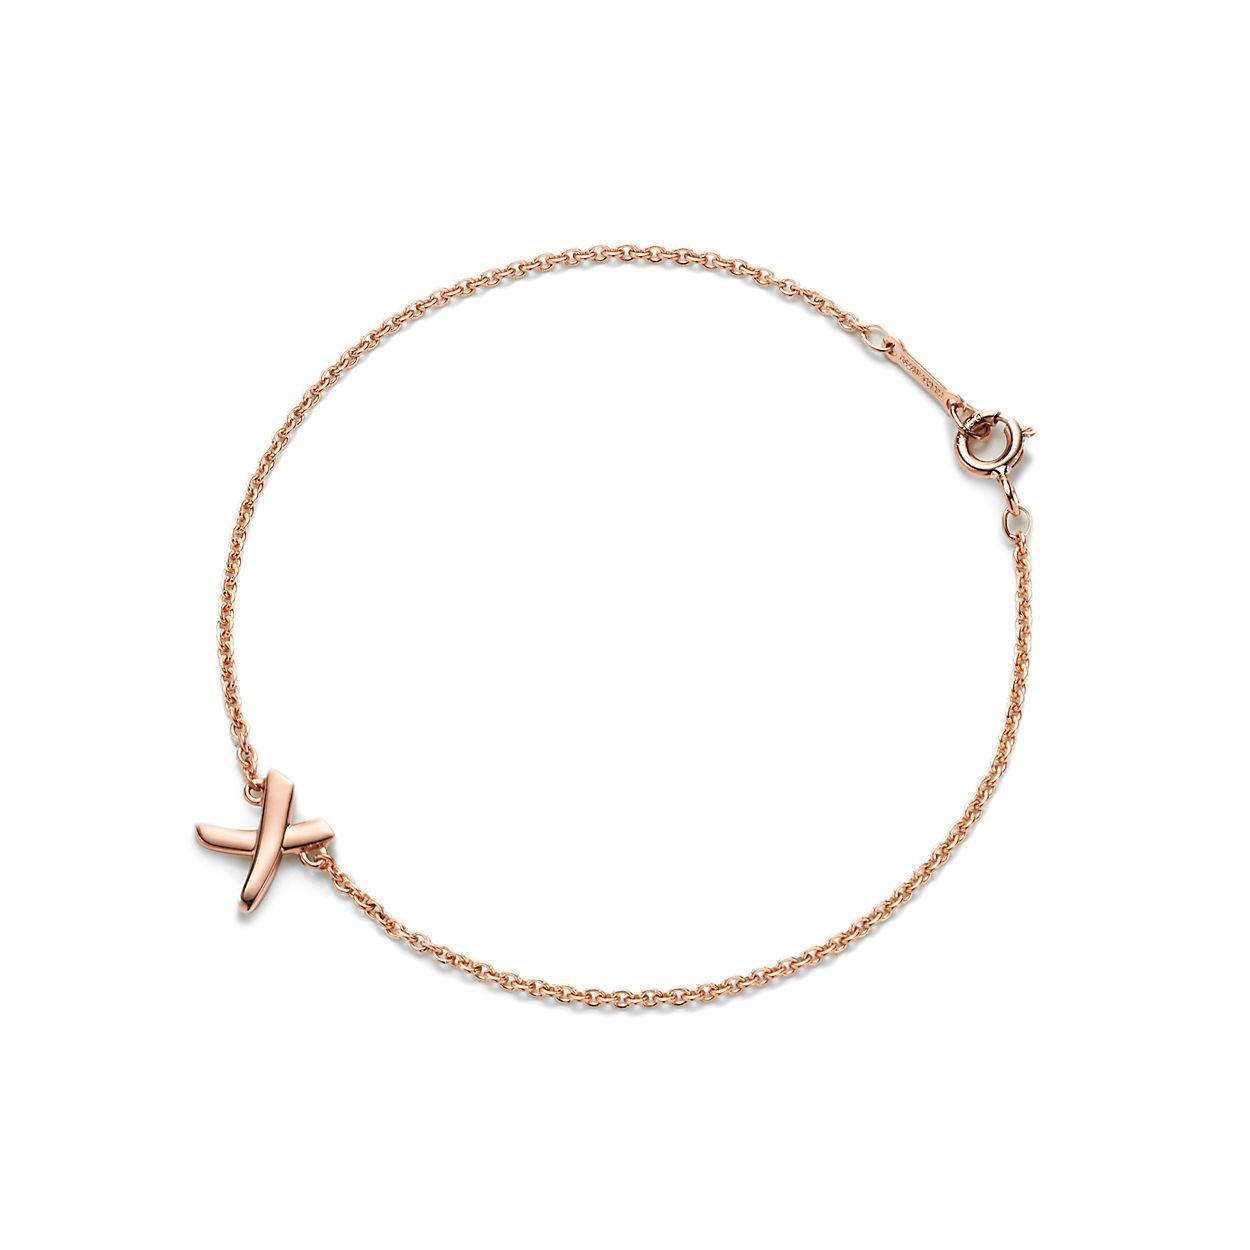 Palomas Graffiti X bracelet in 18ct gold, medium Tiffany & Co.